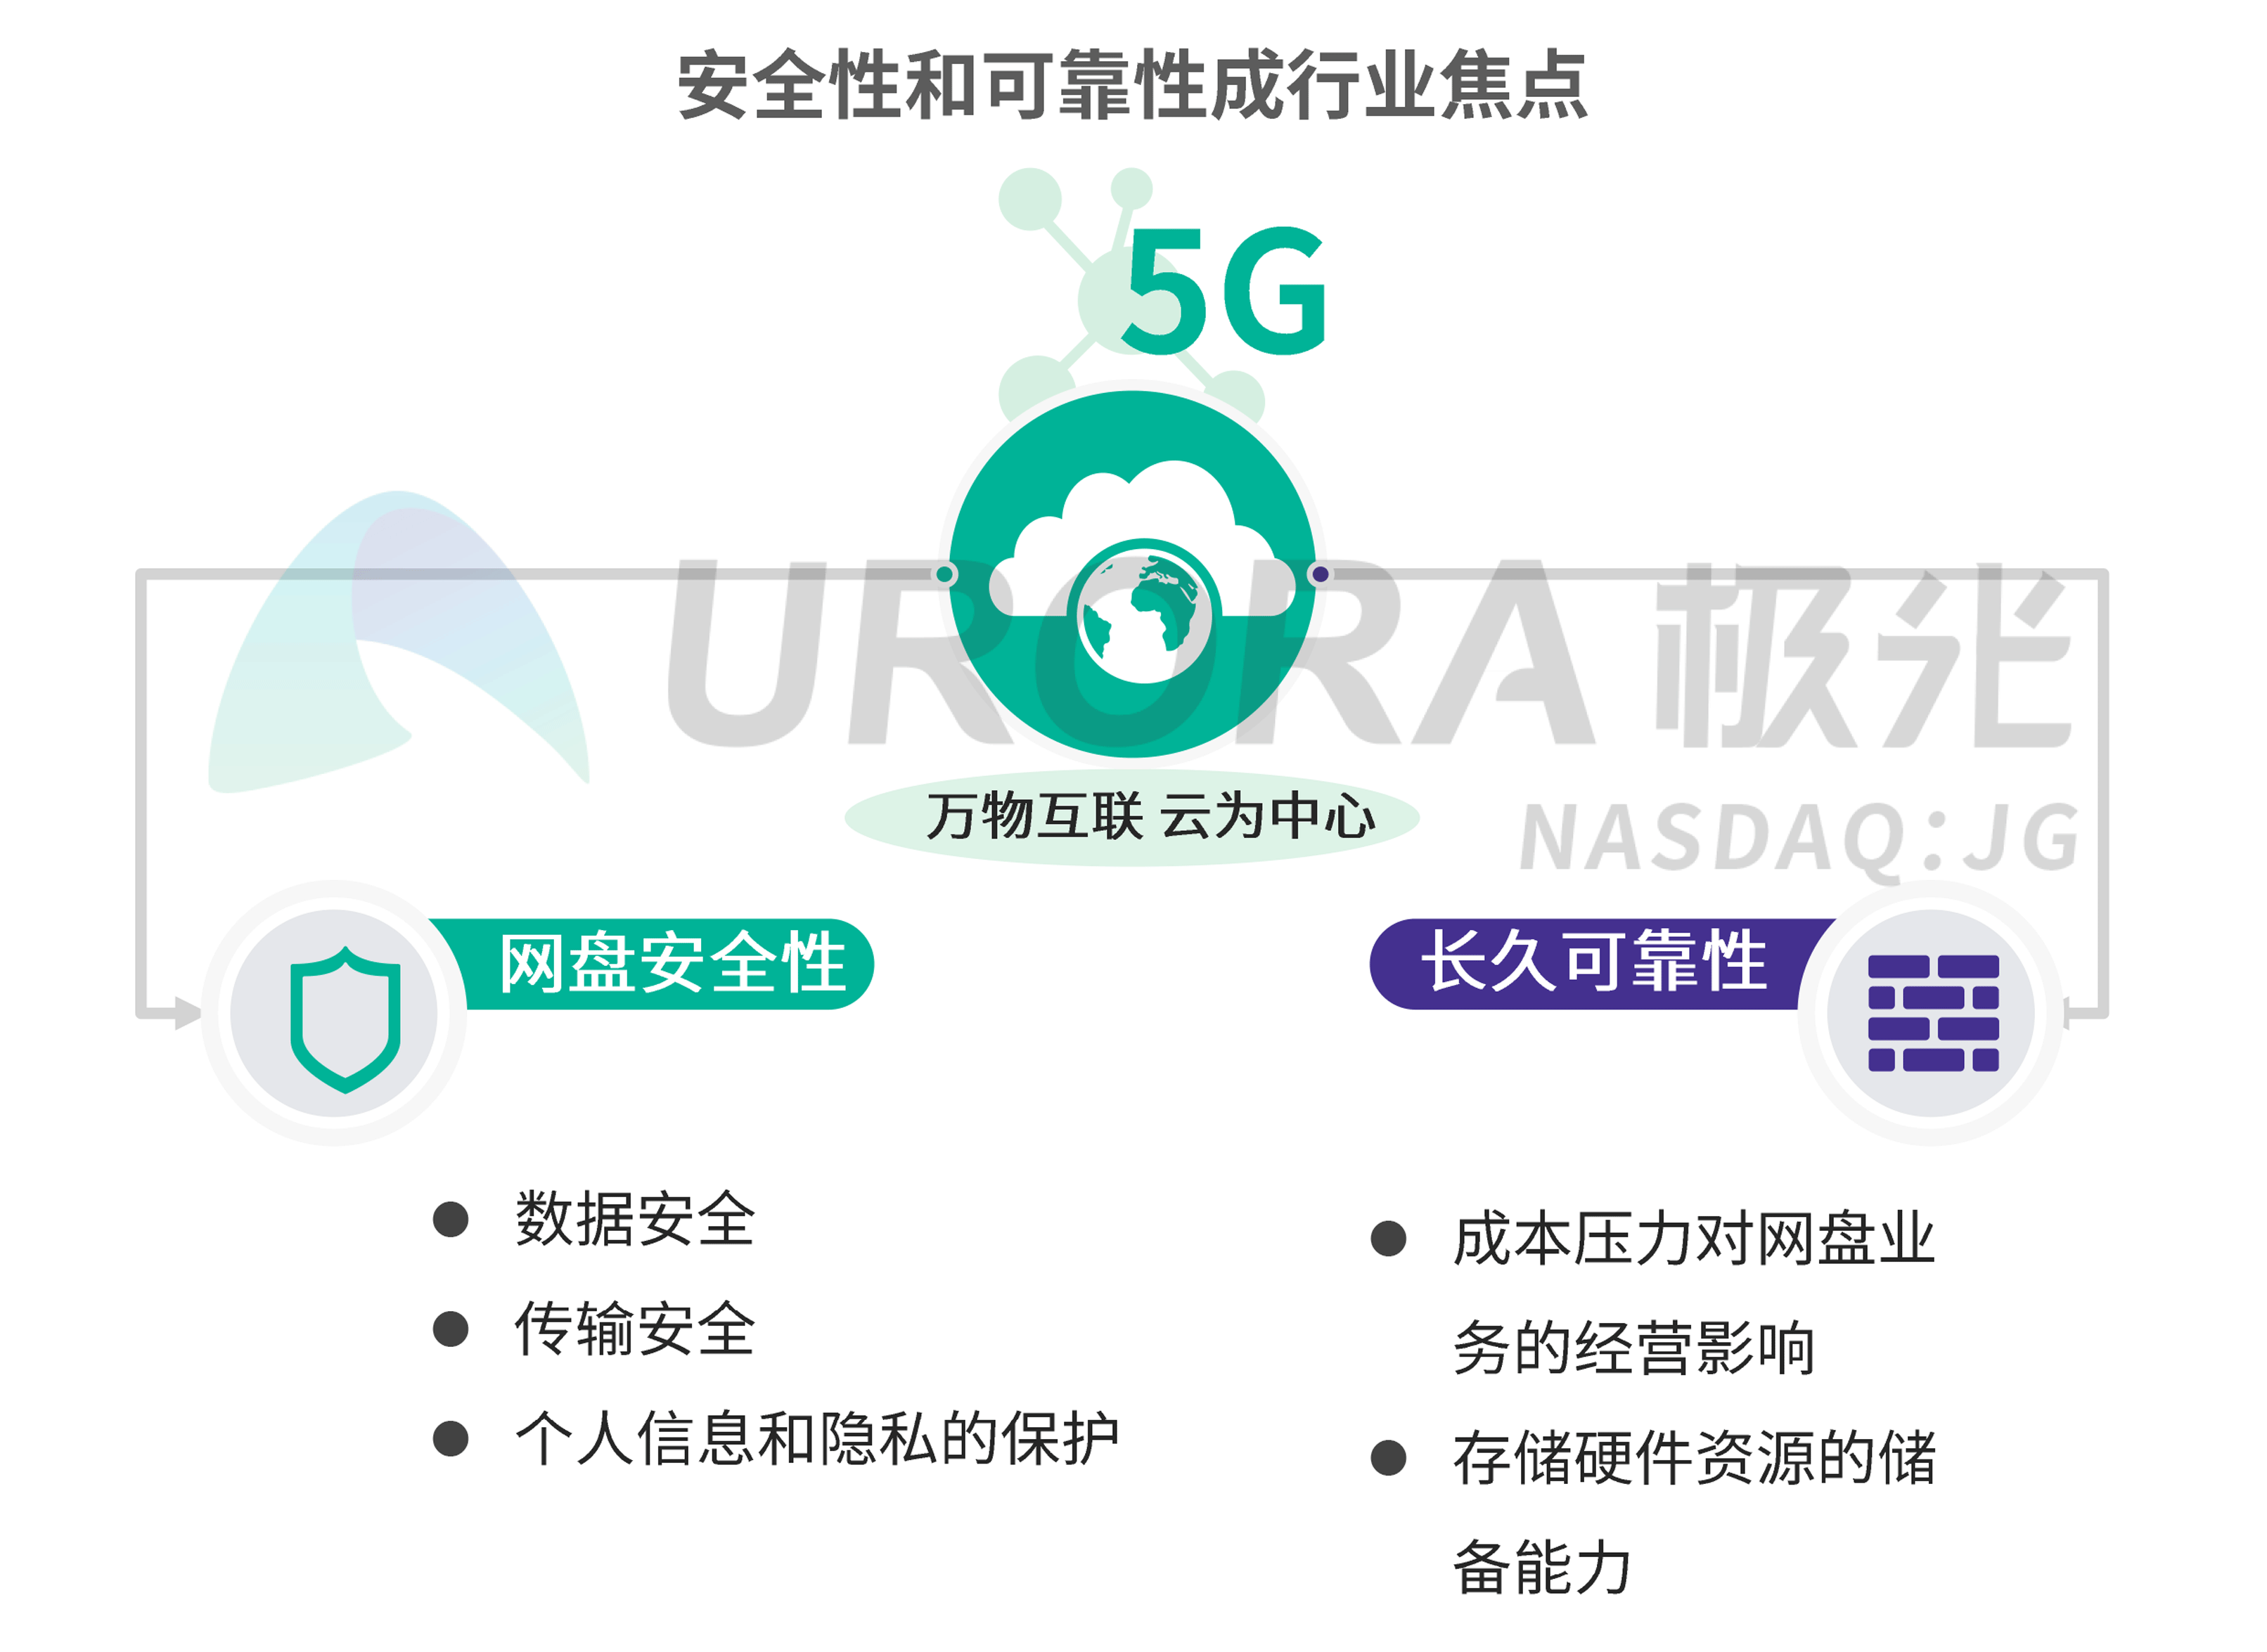 JIGUANG-个人网盘行业研究报告-final---切图版2-33.png